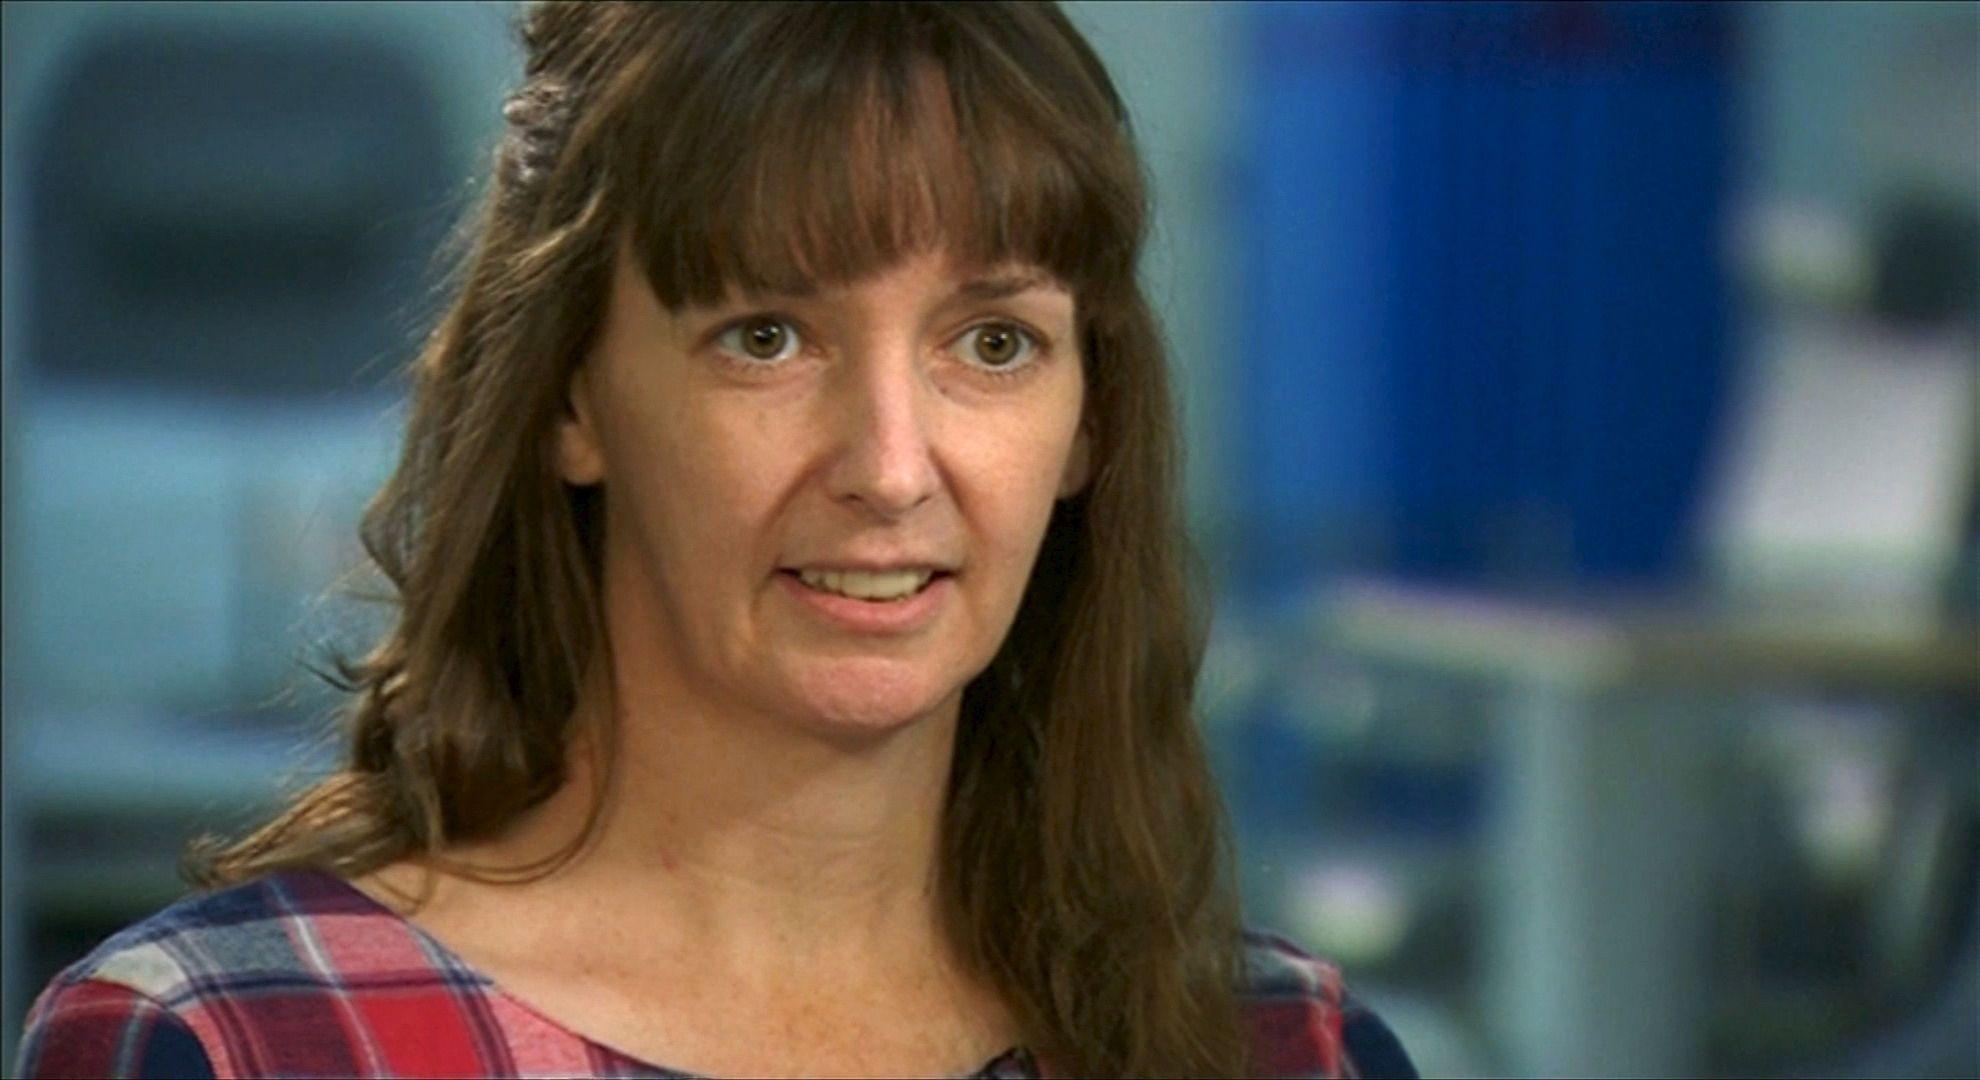 Scottish nurse Pauline Cafferkey, who contracted Ebola, speaks in an interview.